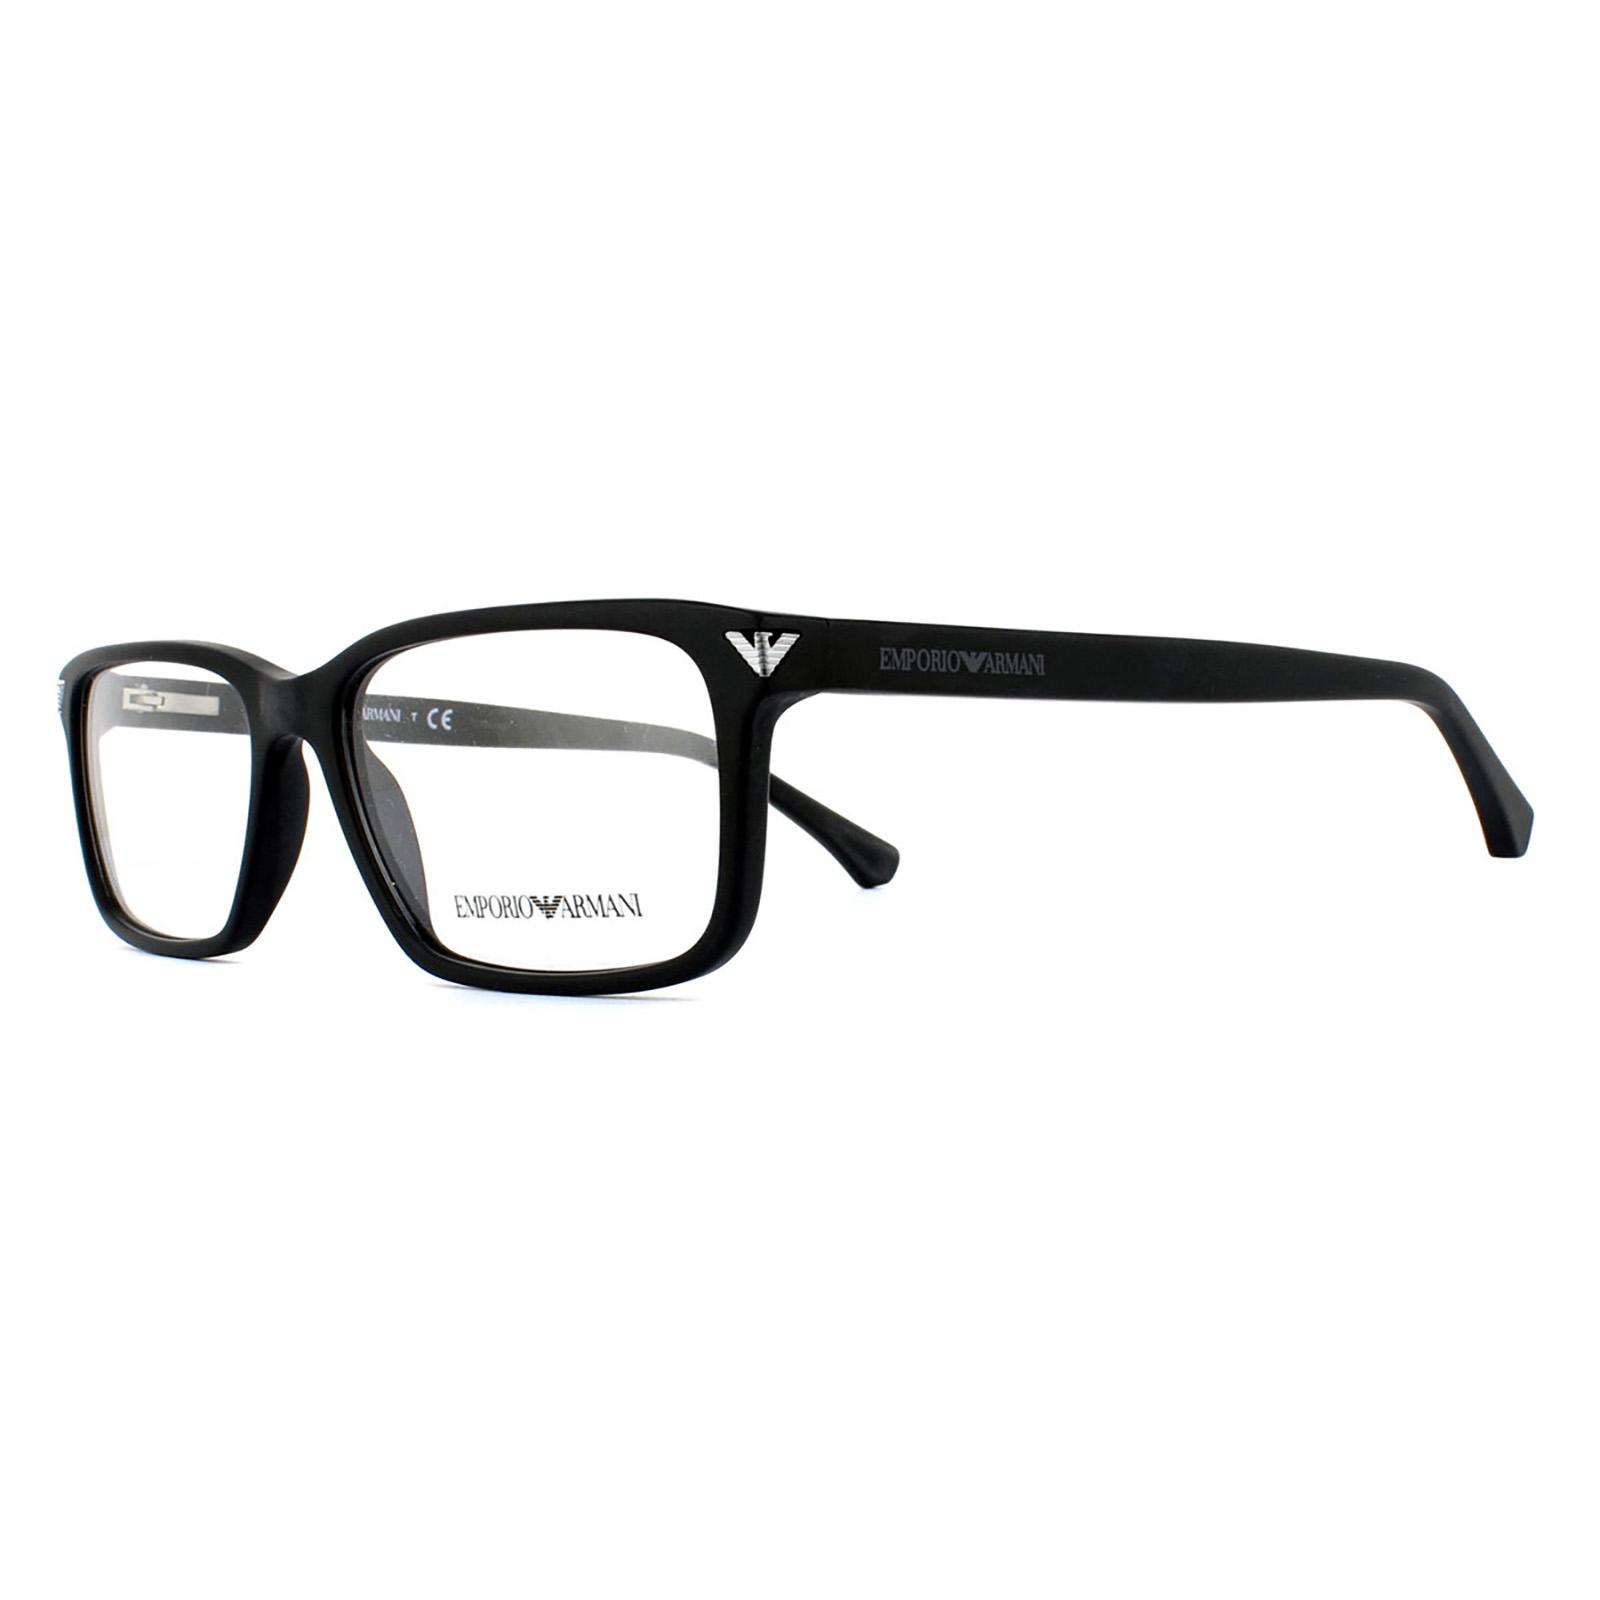 cheap emporio armani 3072 glasses frames discounted